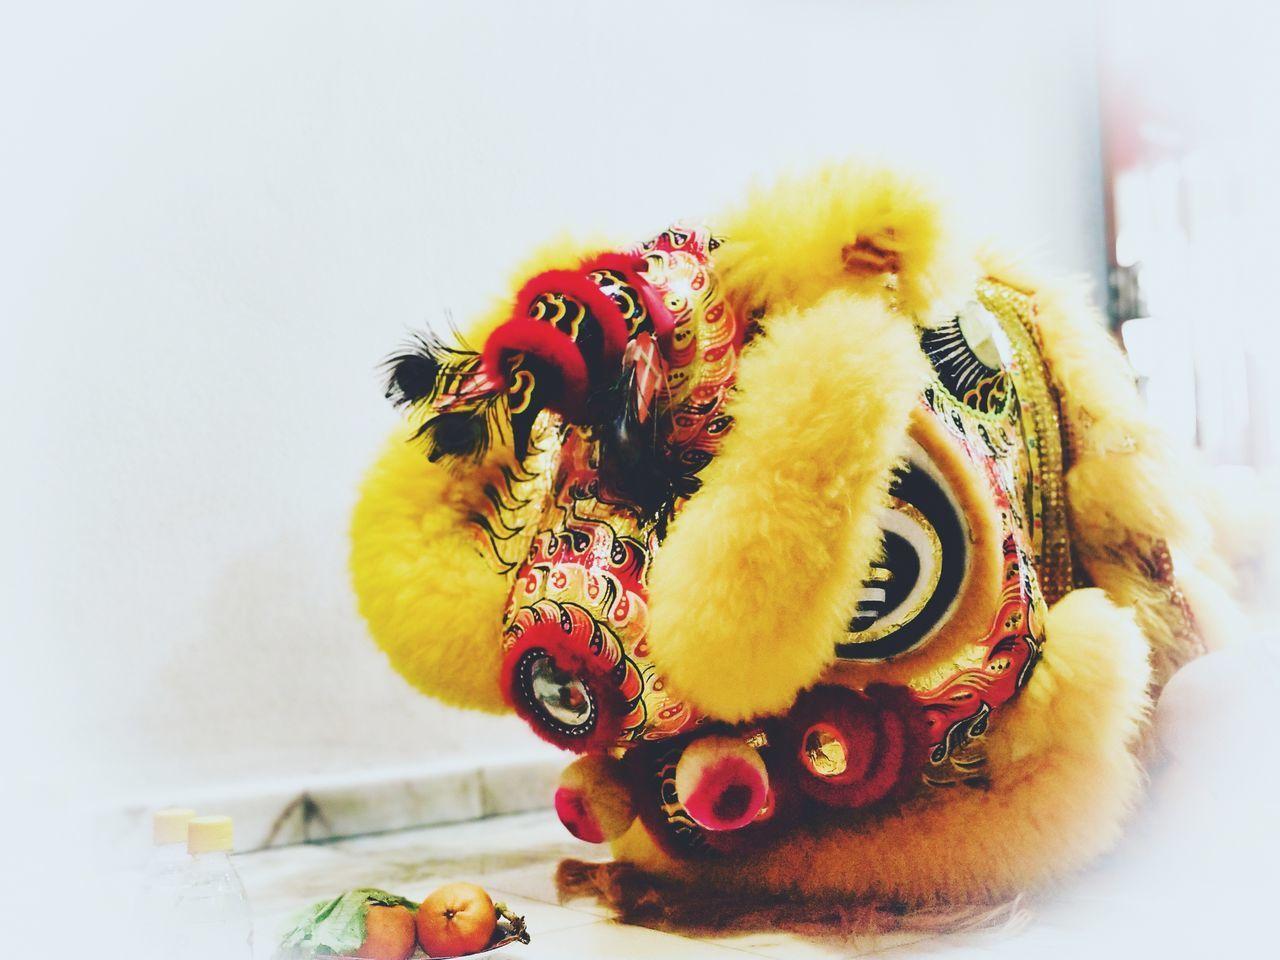 indoors, close-up, animal, animal themes, no people, toy, mammal, representation, animal representation, domestic animals, celebration, stuffed toy, one animal, decoration, holiday, pets, yellow, vertebrate, domestic